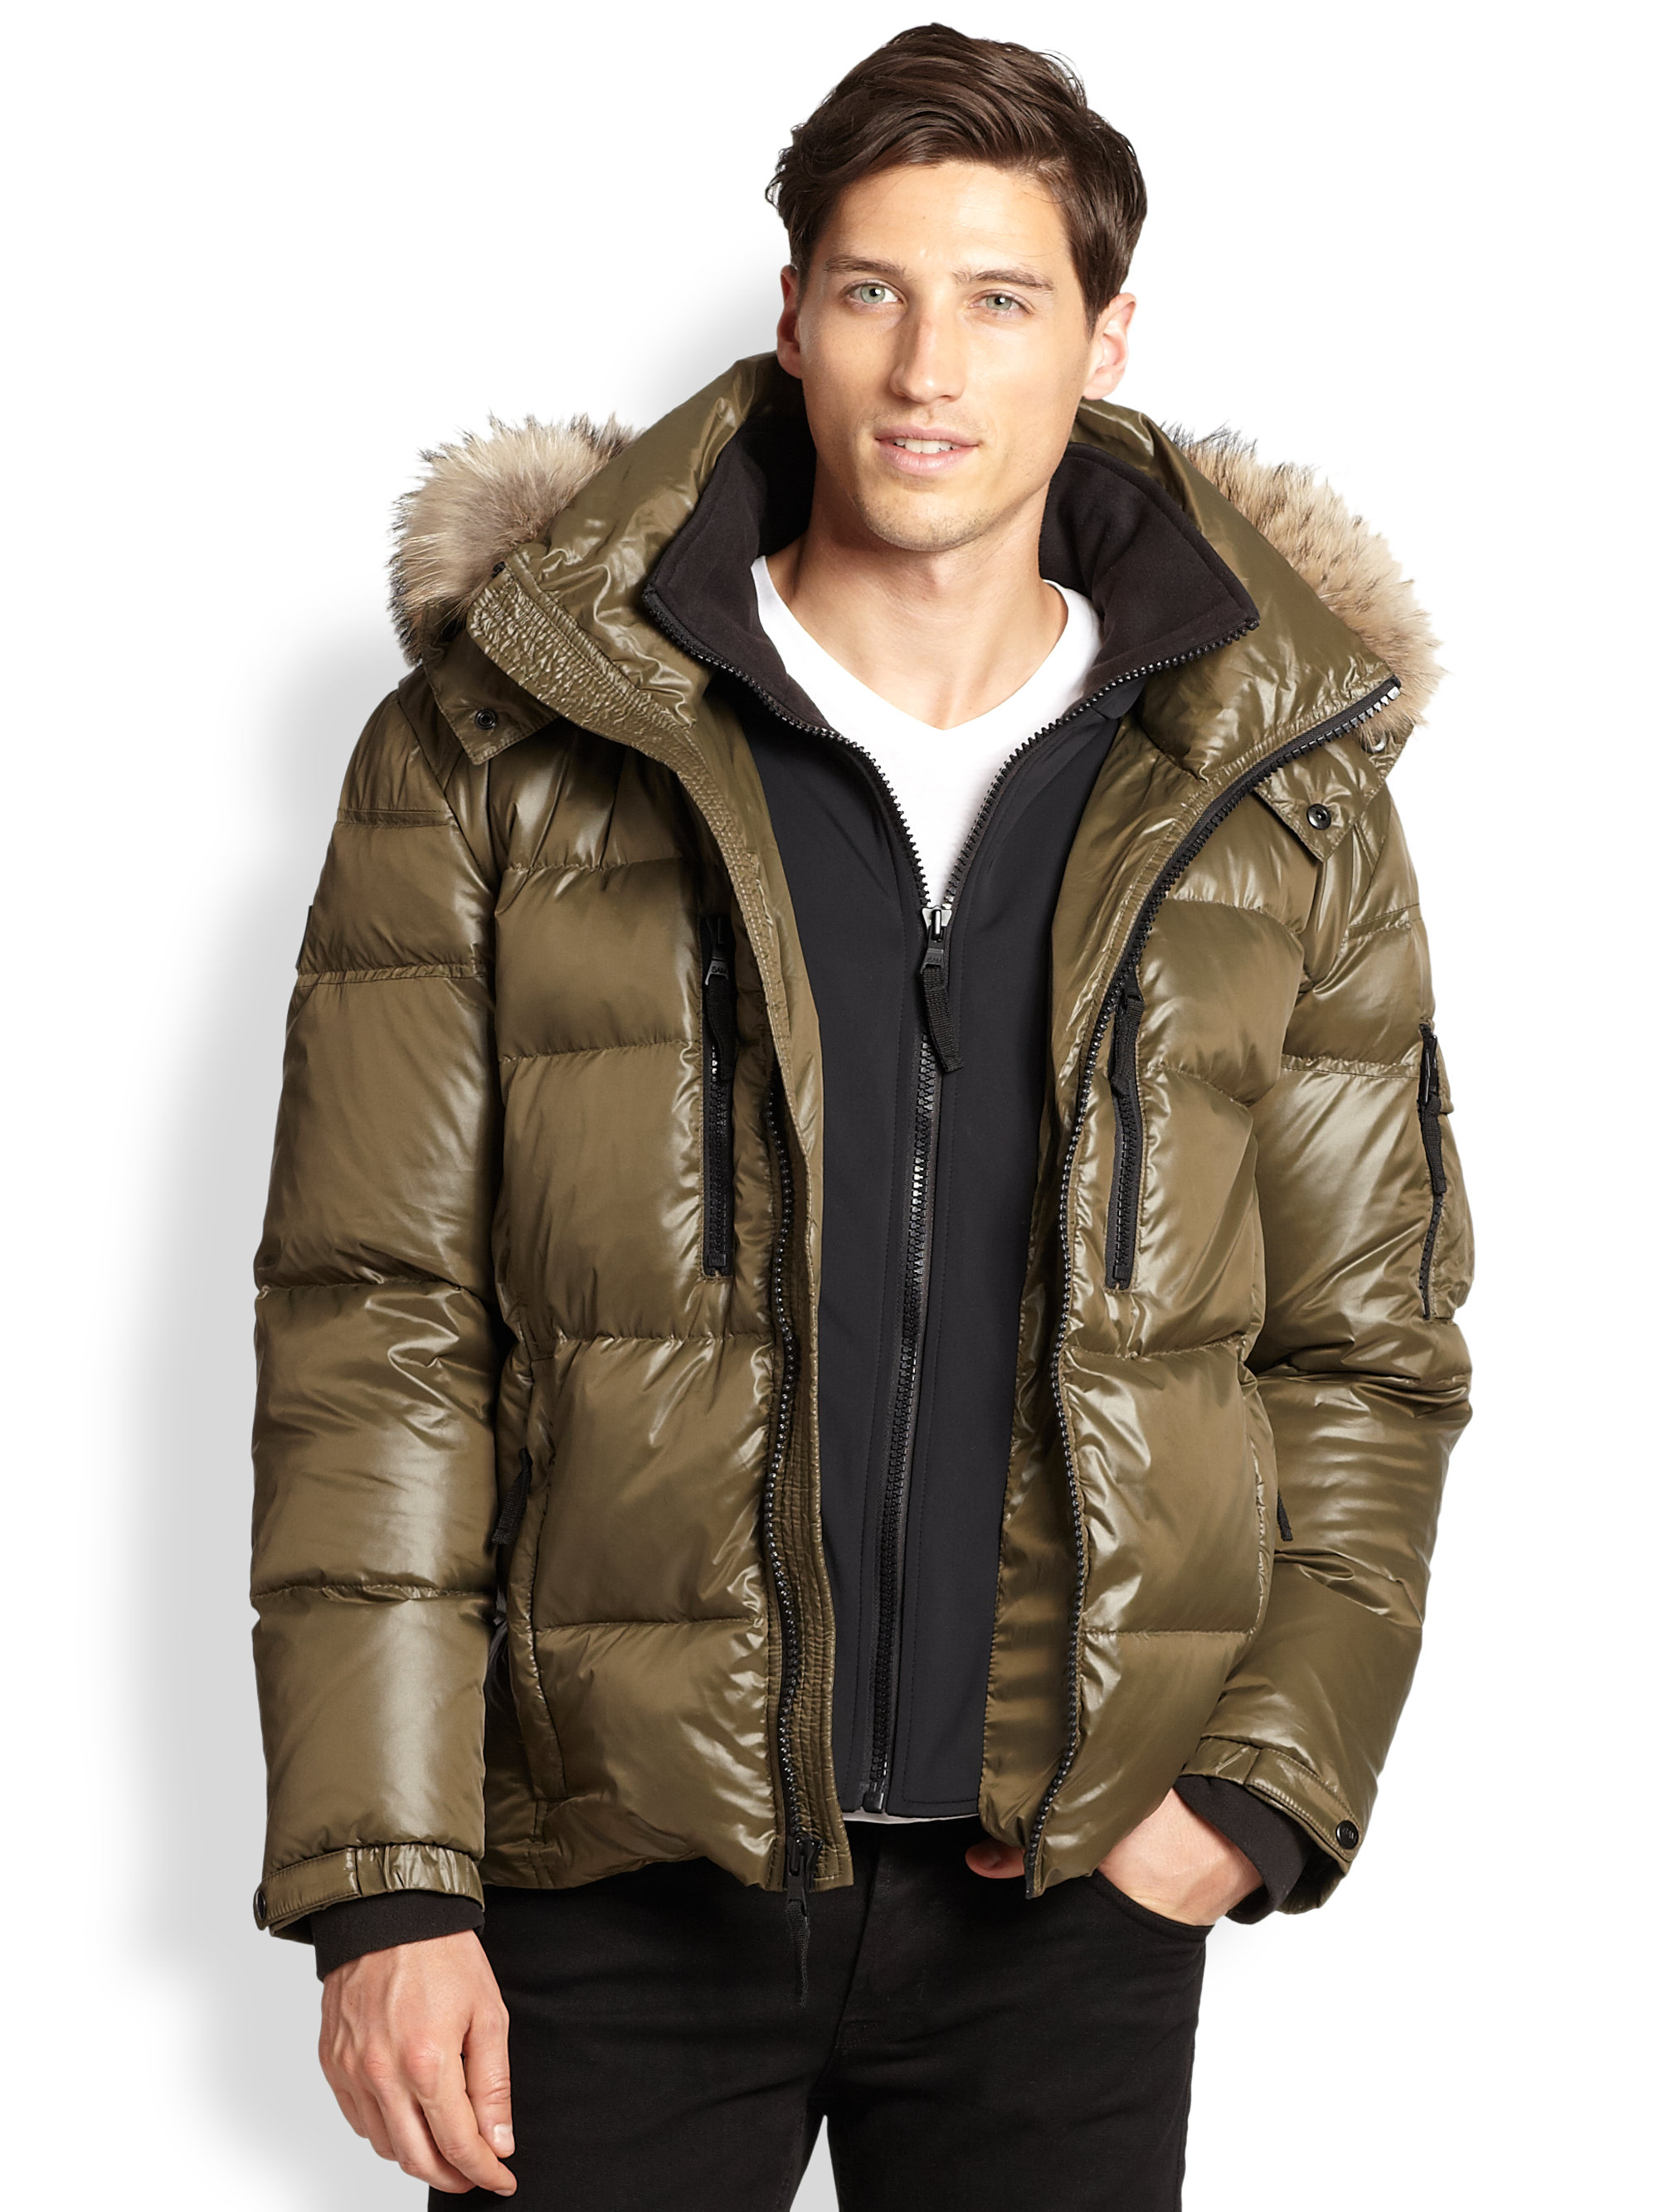 Sam Fur Trimmed Mountain Puffer Jacket In Beige For Men